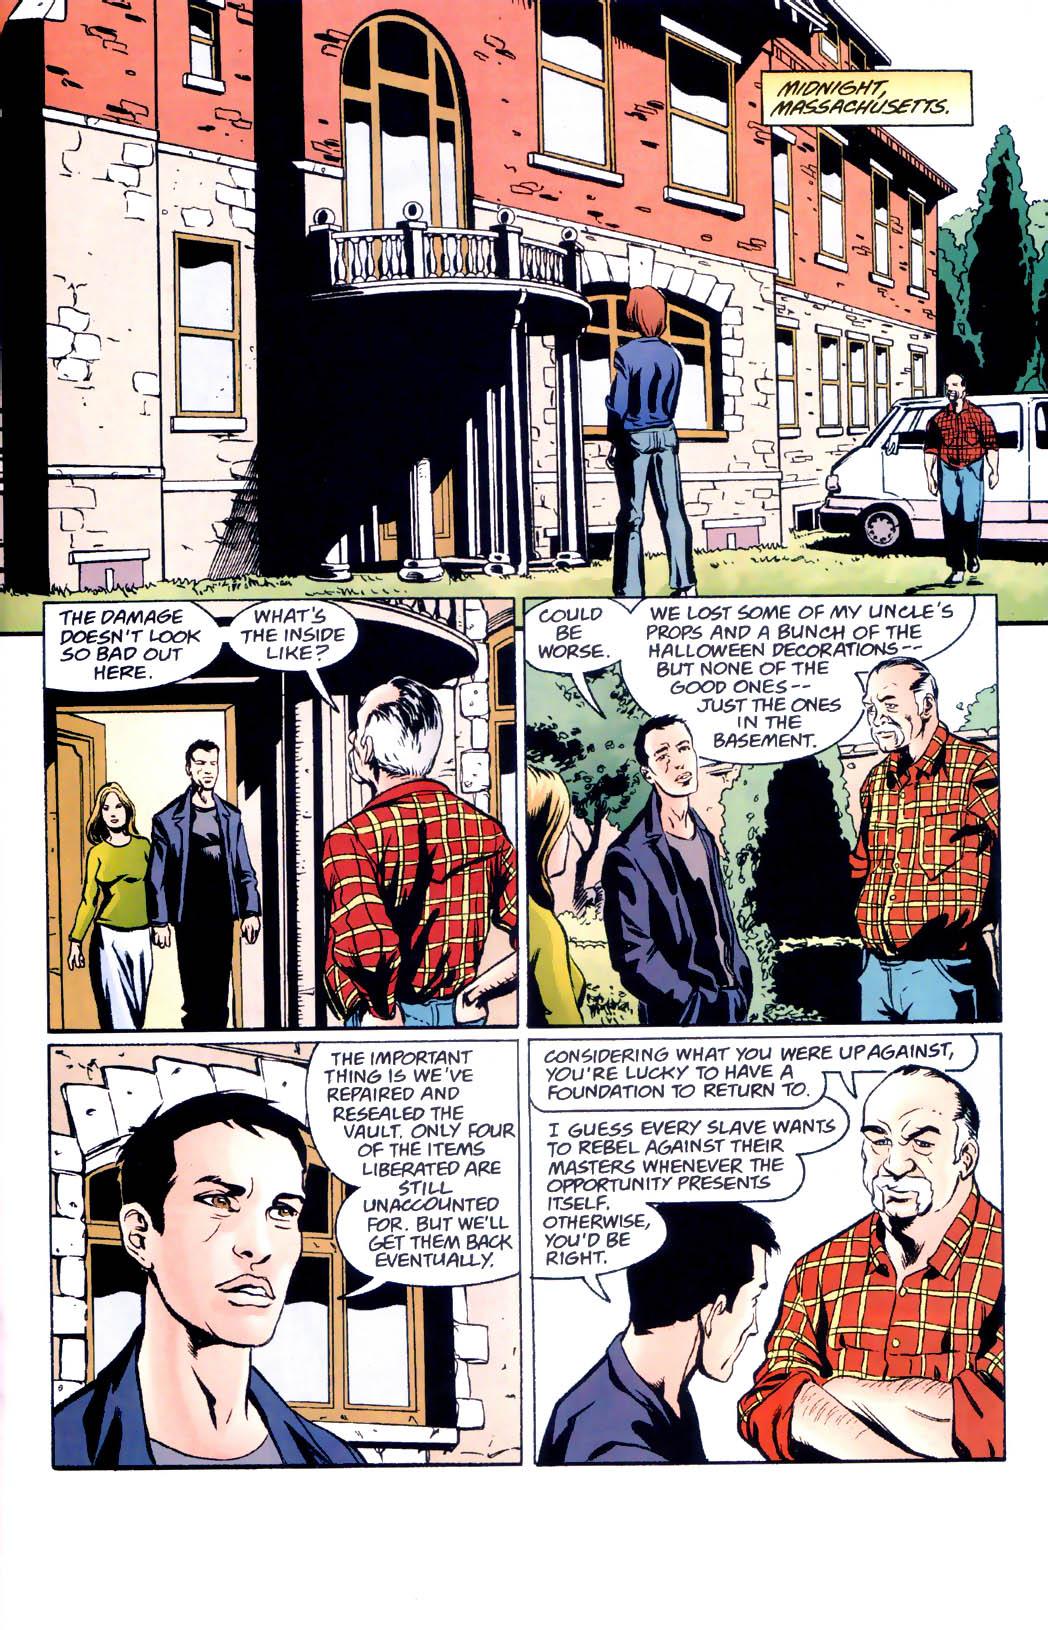 Read online Midnight, Mass comic -  Issue #7 - 2